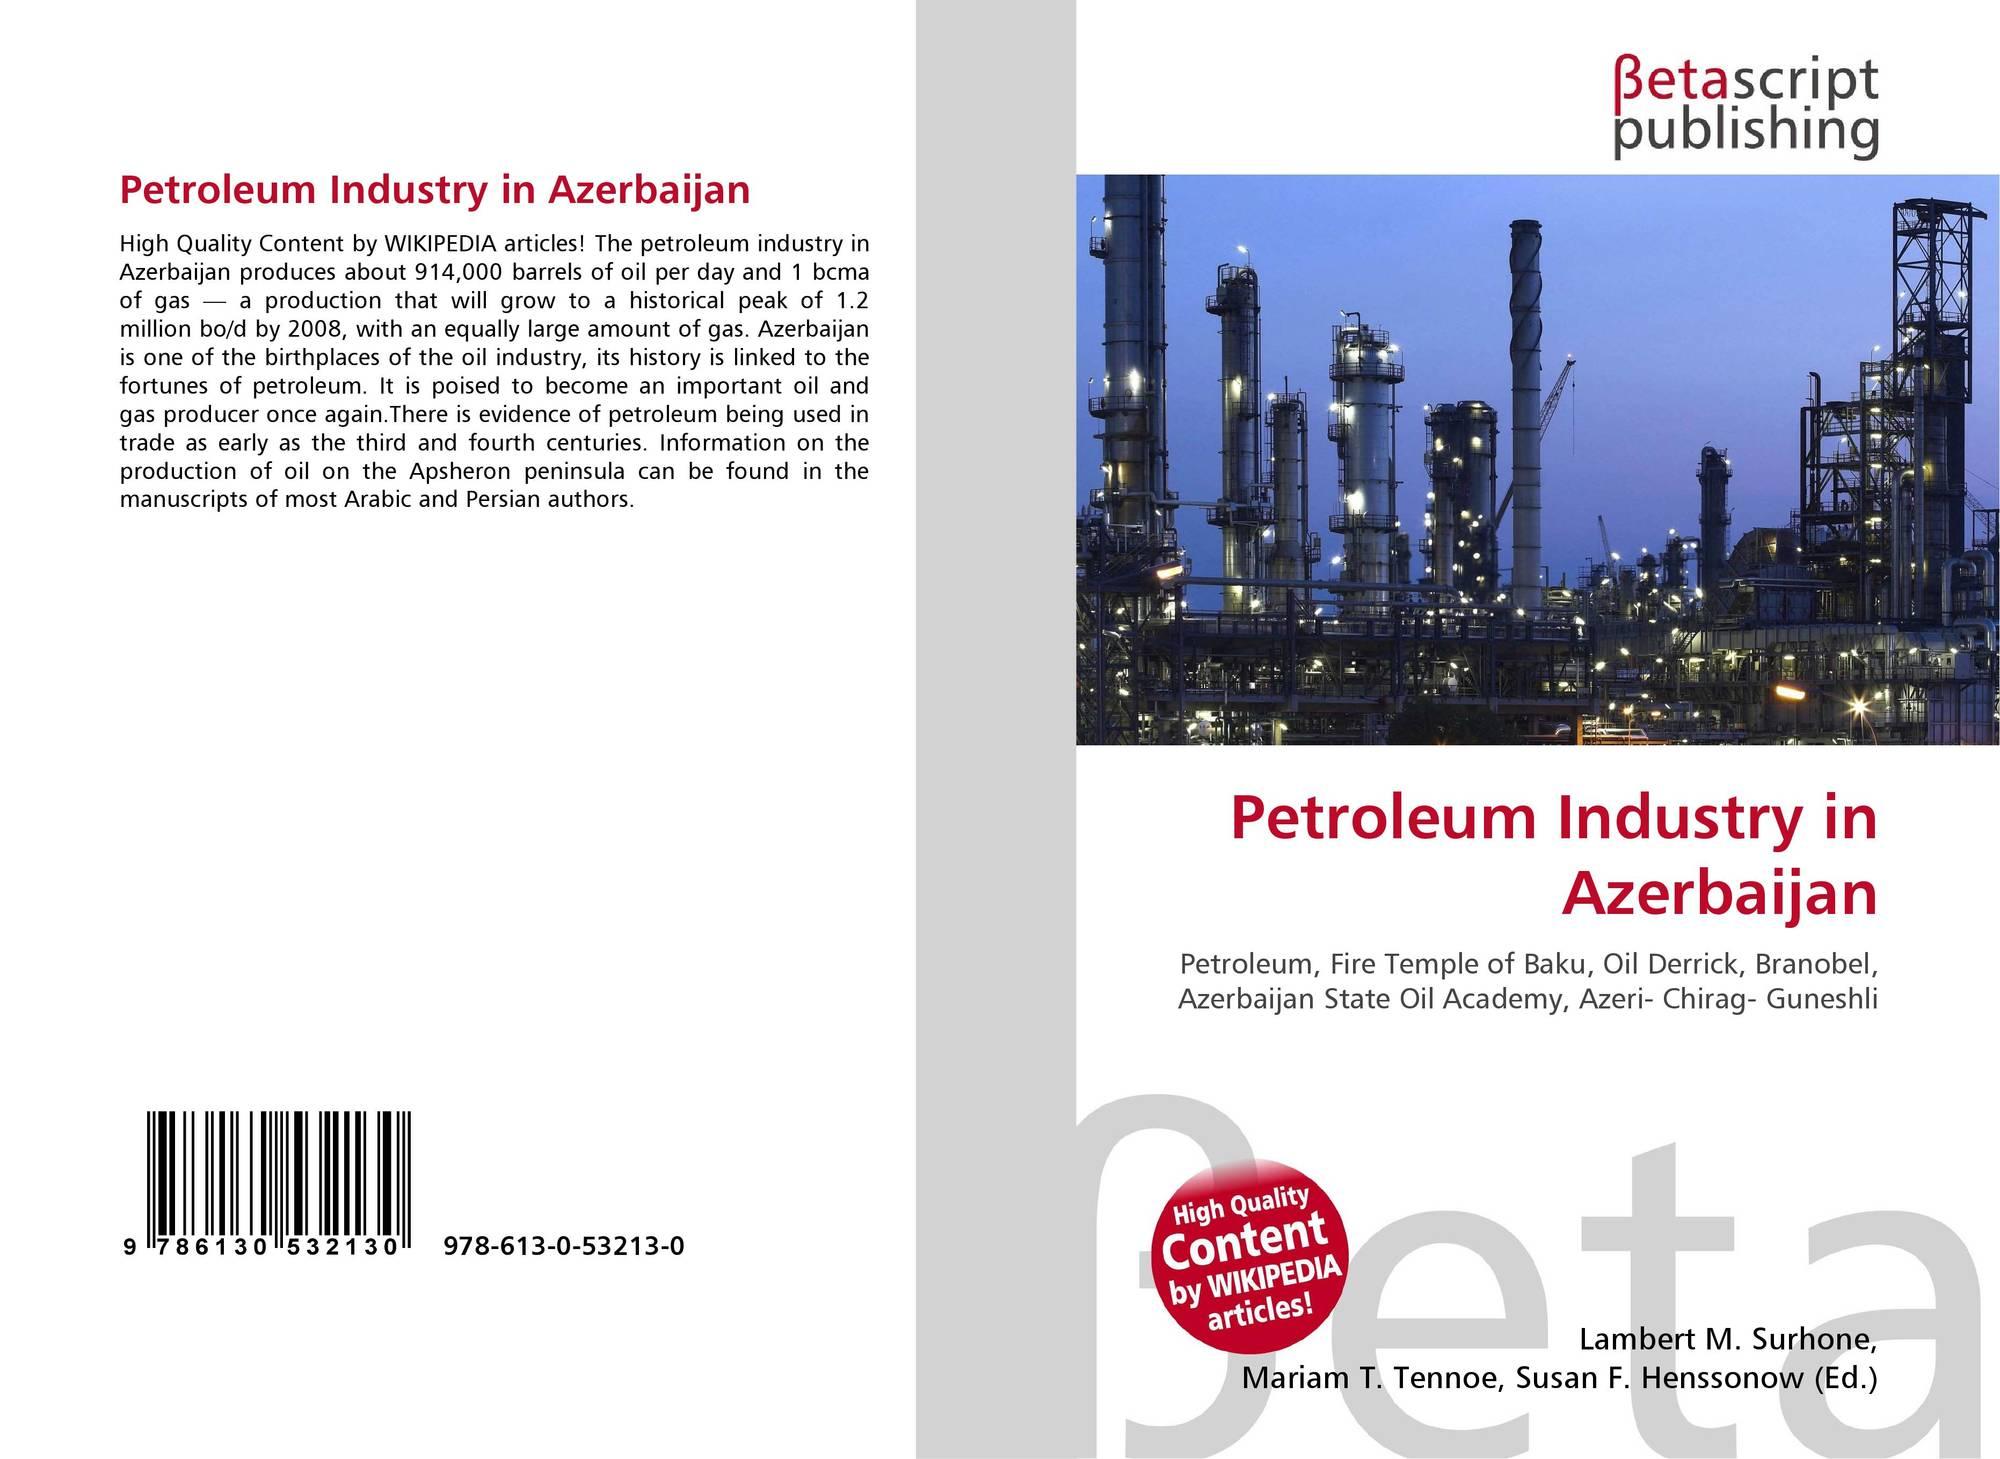 Petroleum Industry in Azerbaijan, 978-613-0-53213-0, 6130532